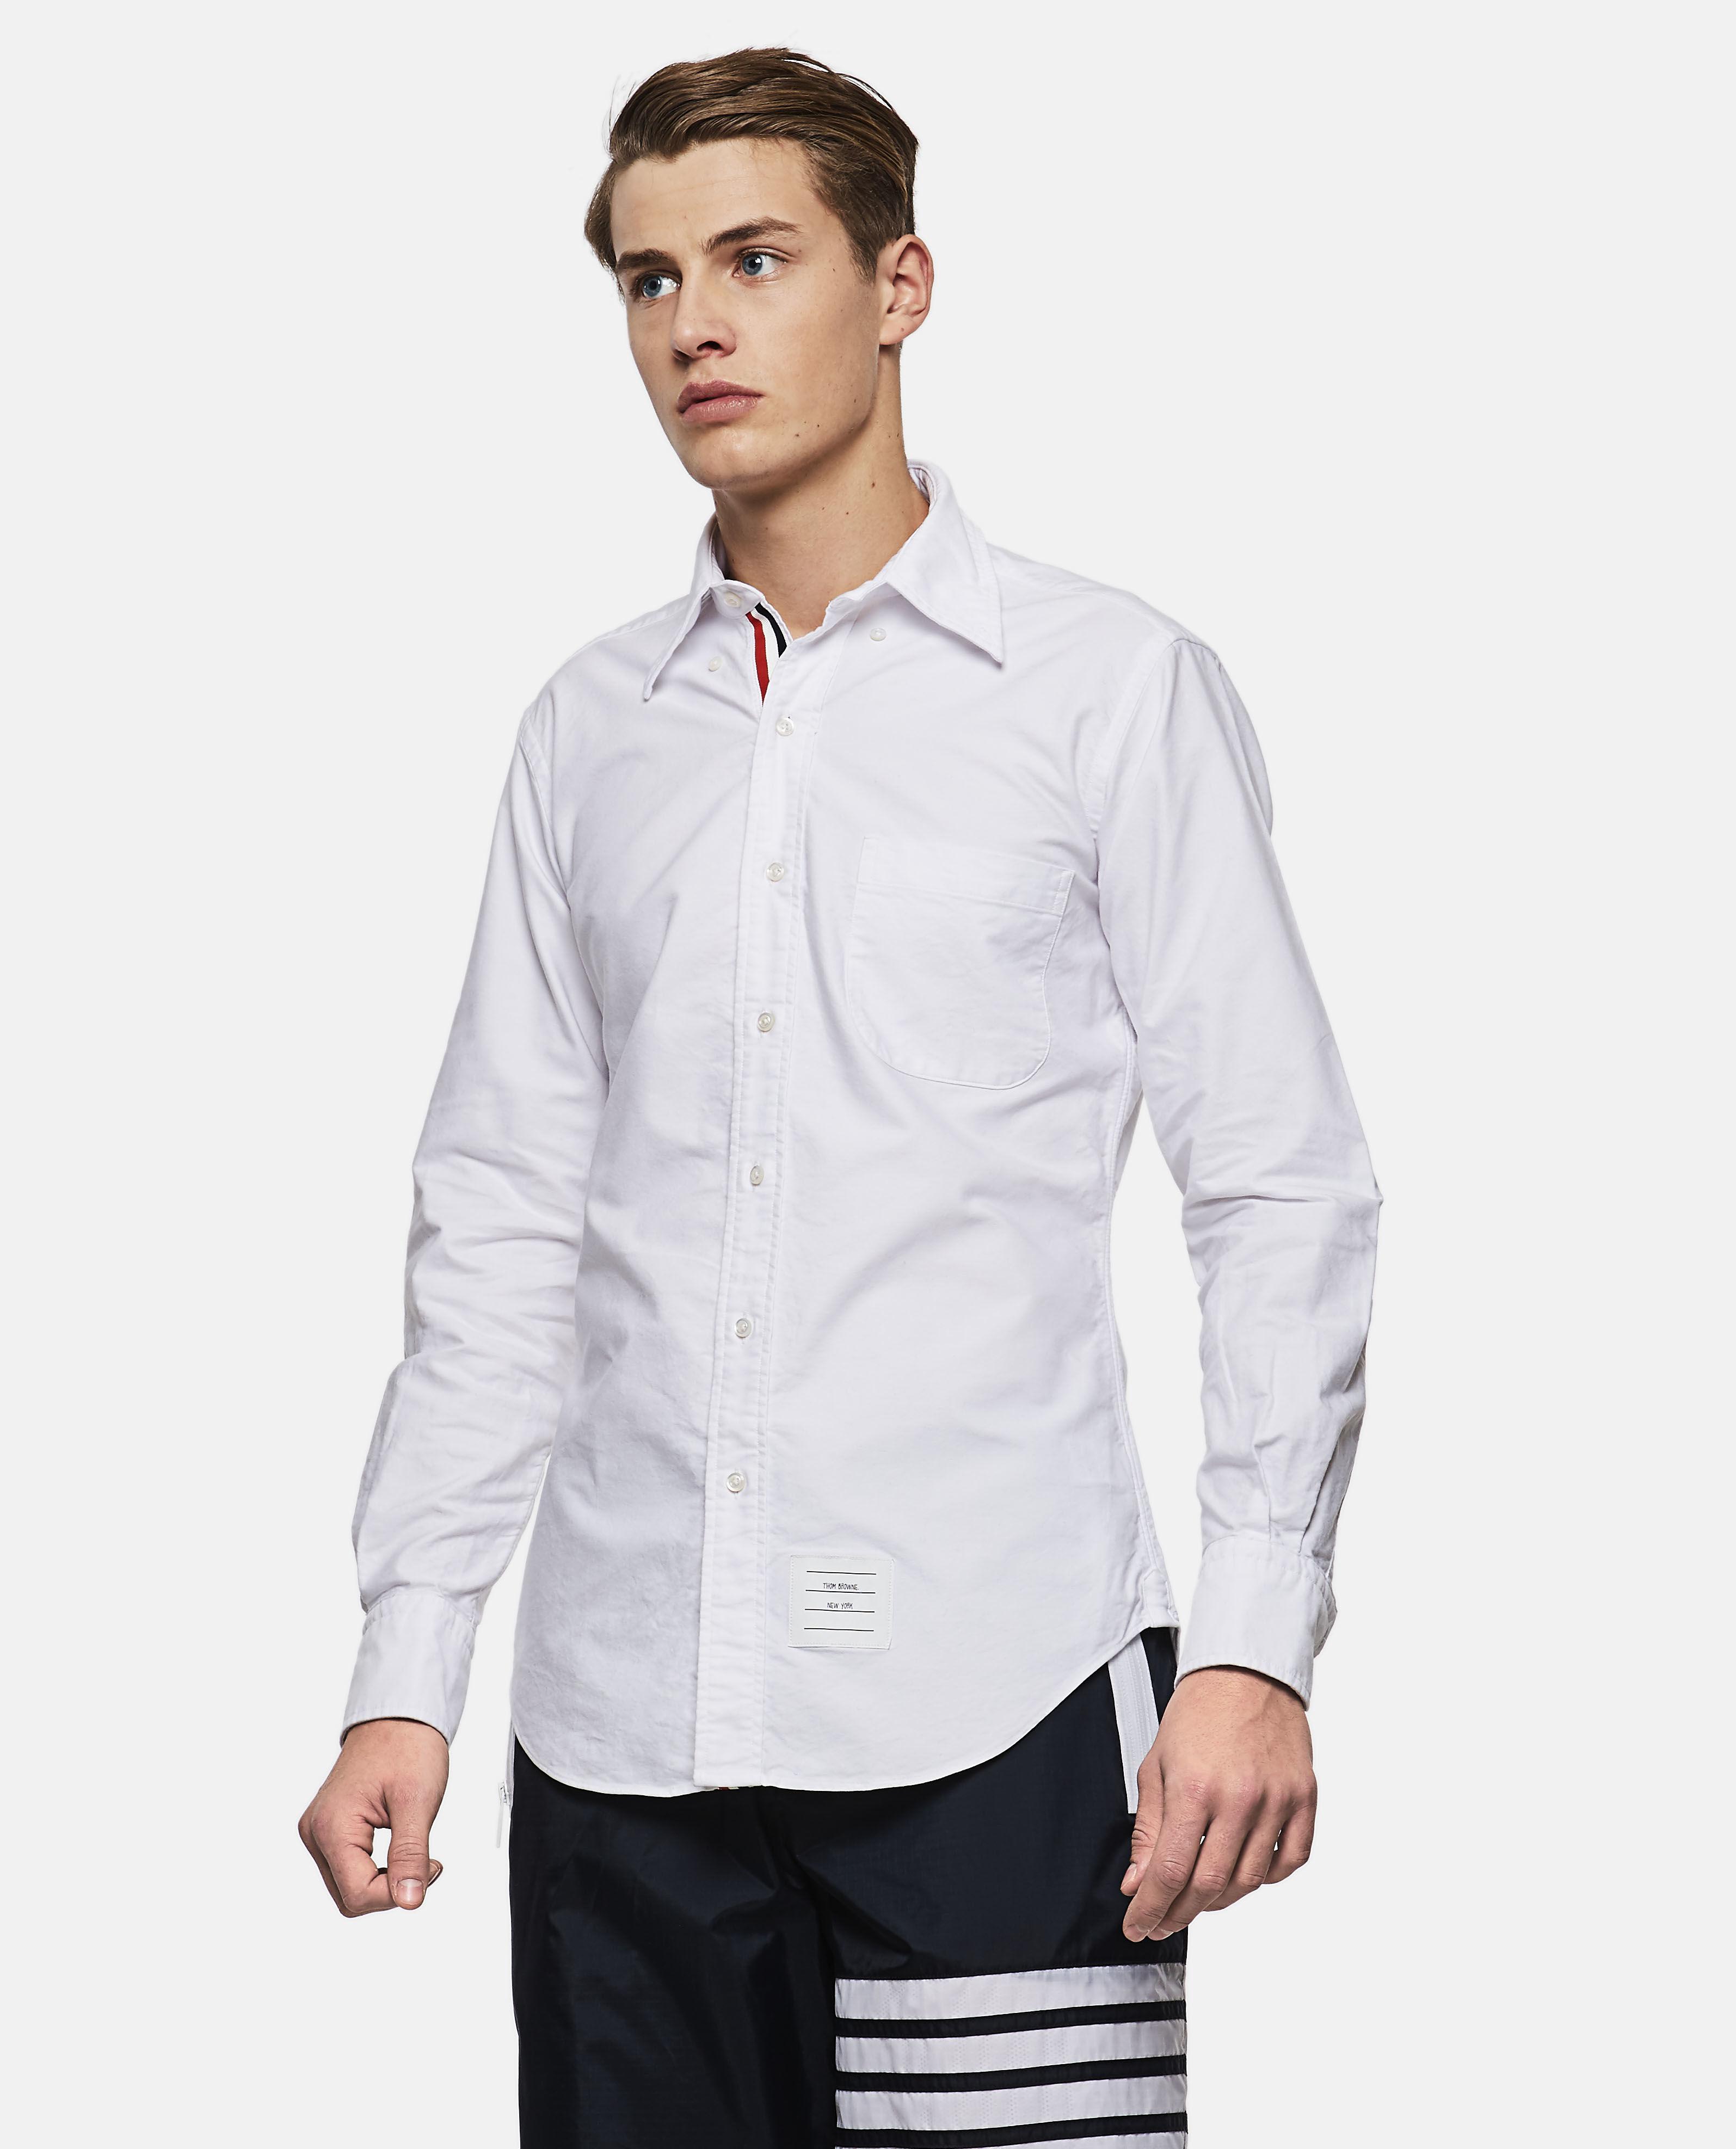 a4c9c7a97c1 Thom Browne - White Botton Down Shirt for Men - Lyst. View fullscreen